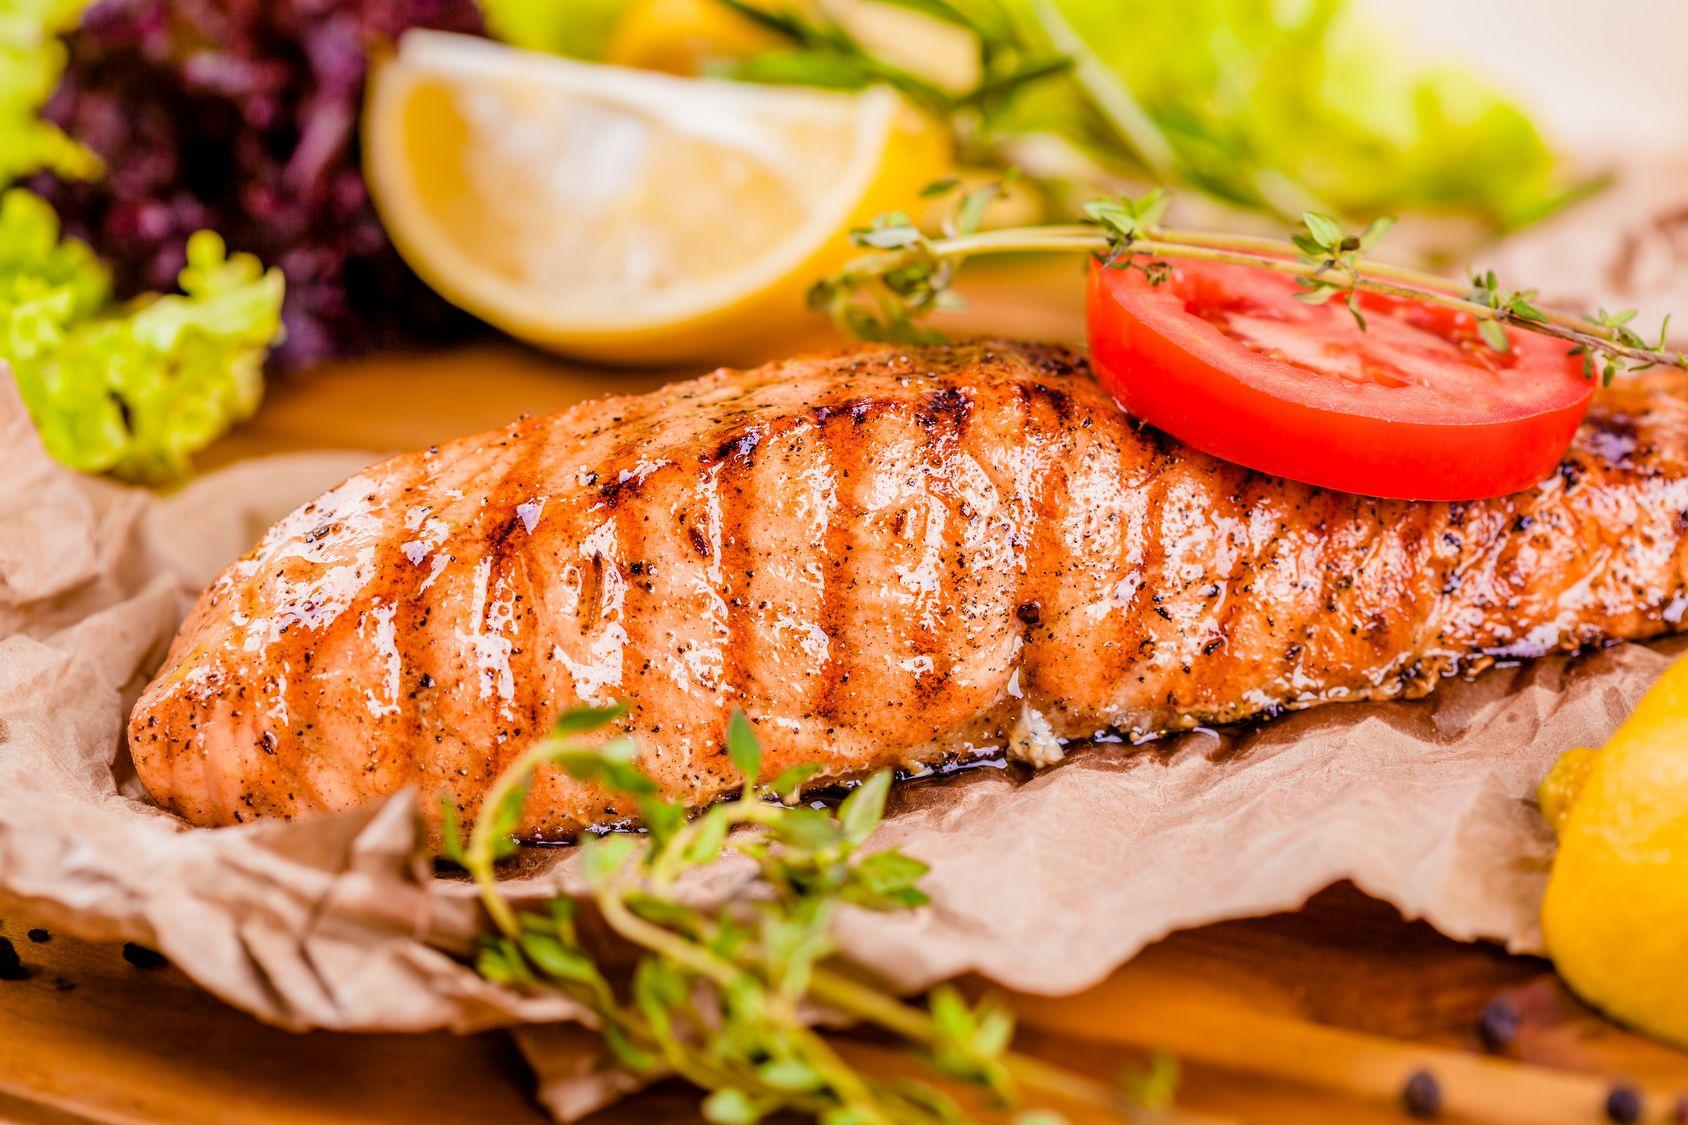 Saumon cuit au barbecue La cuisine de Doria